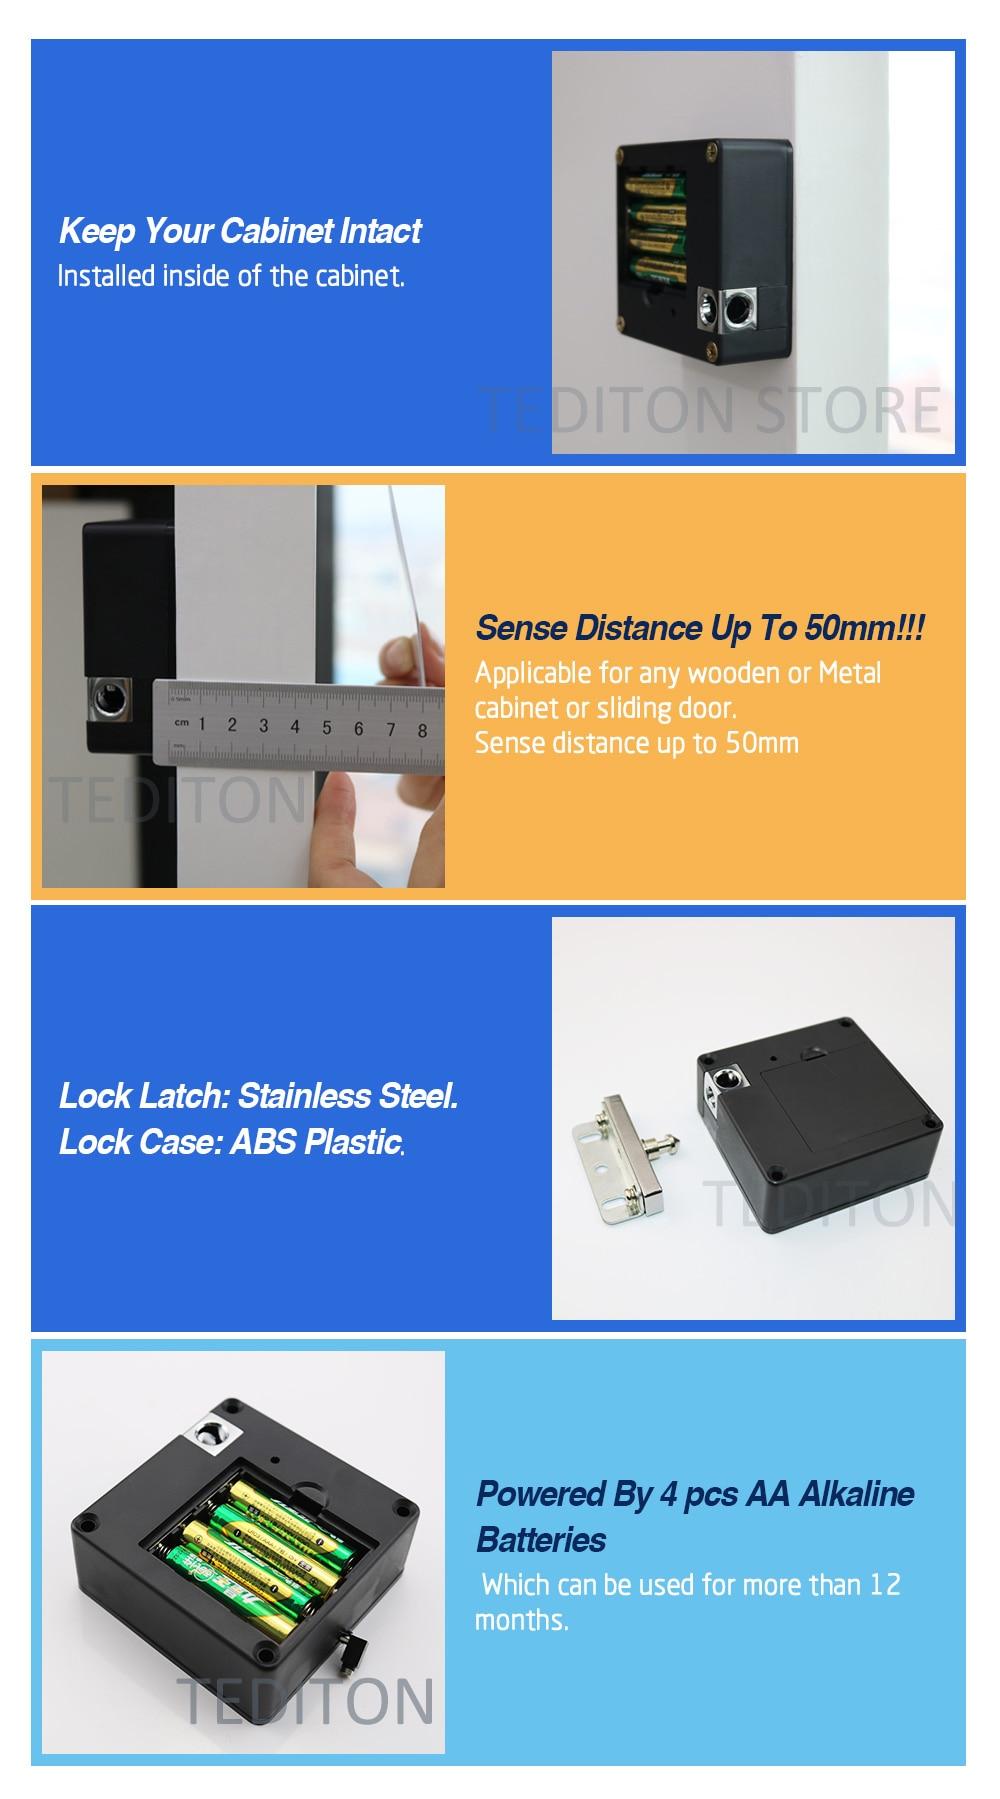 Hf3ca8a718e37441da5c6c5e137f3c499d Electronic Keyless Digital Door Lock, Invisible RFID Locker Card hidden Lock for Private Drawer, wardrobe cabinet door lock